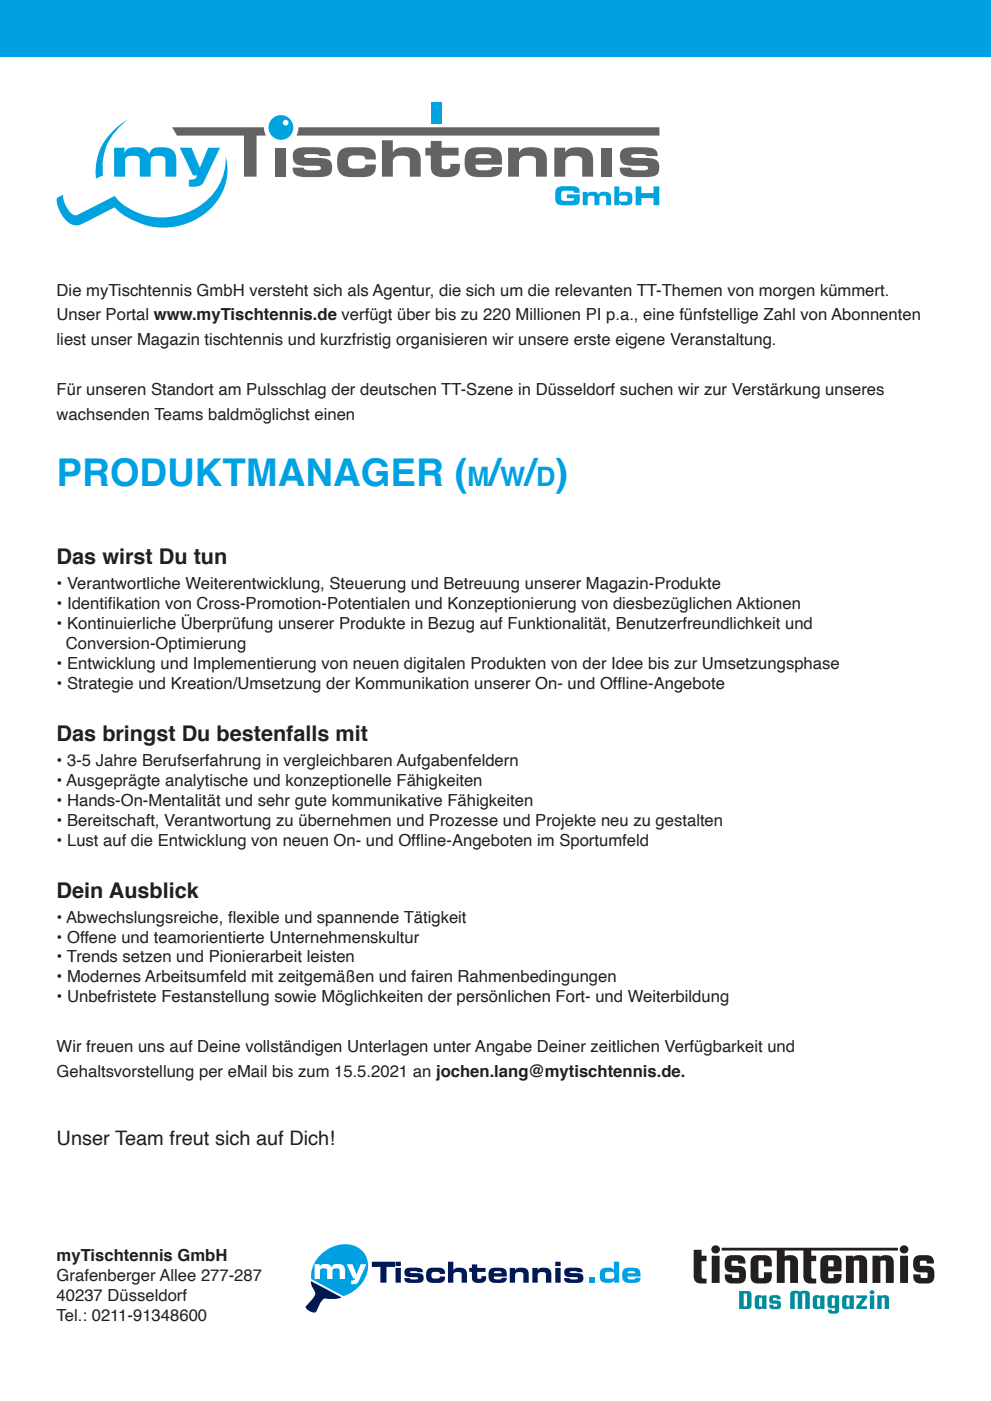 Stellenausschreibung Produktmanager Magazin